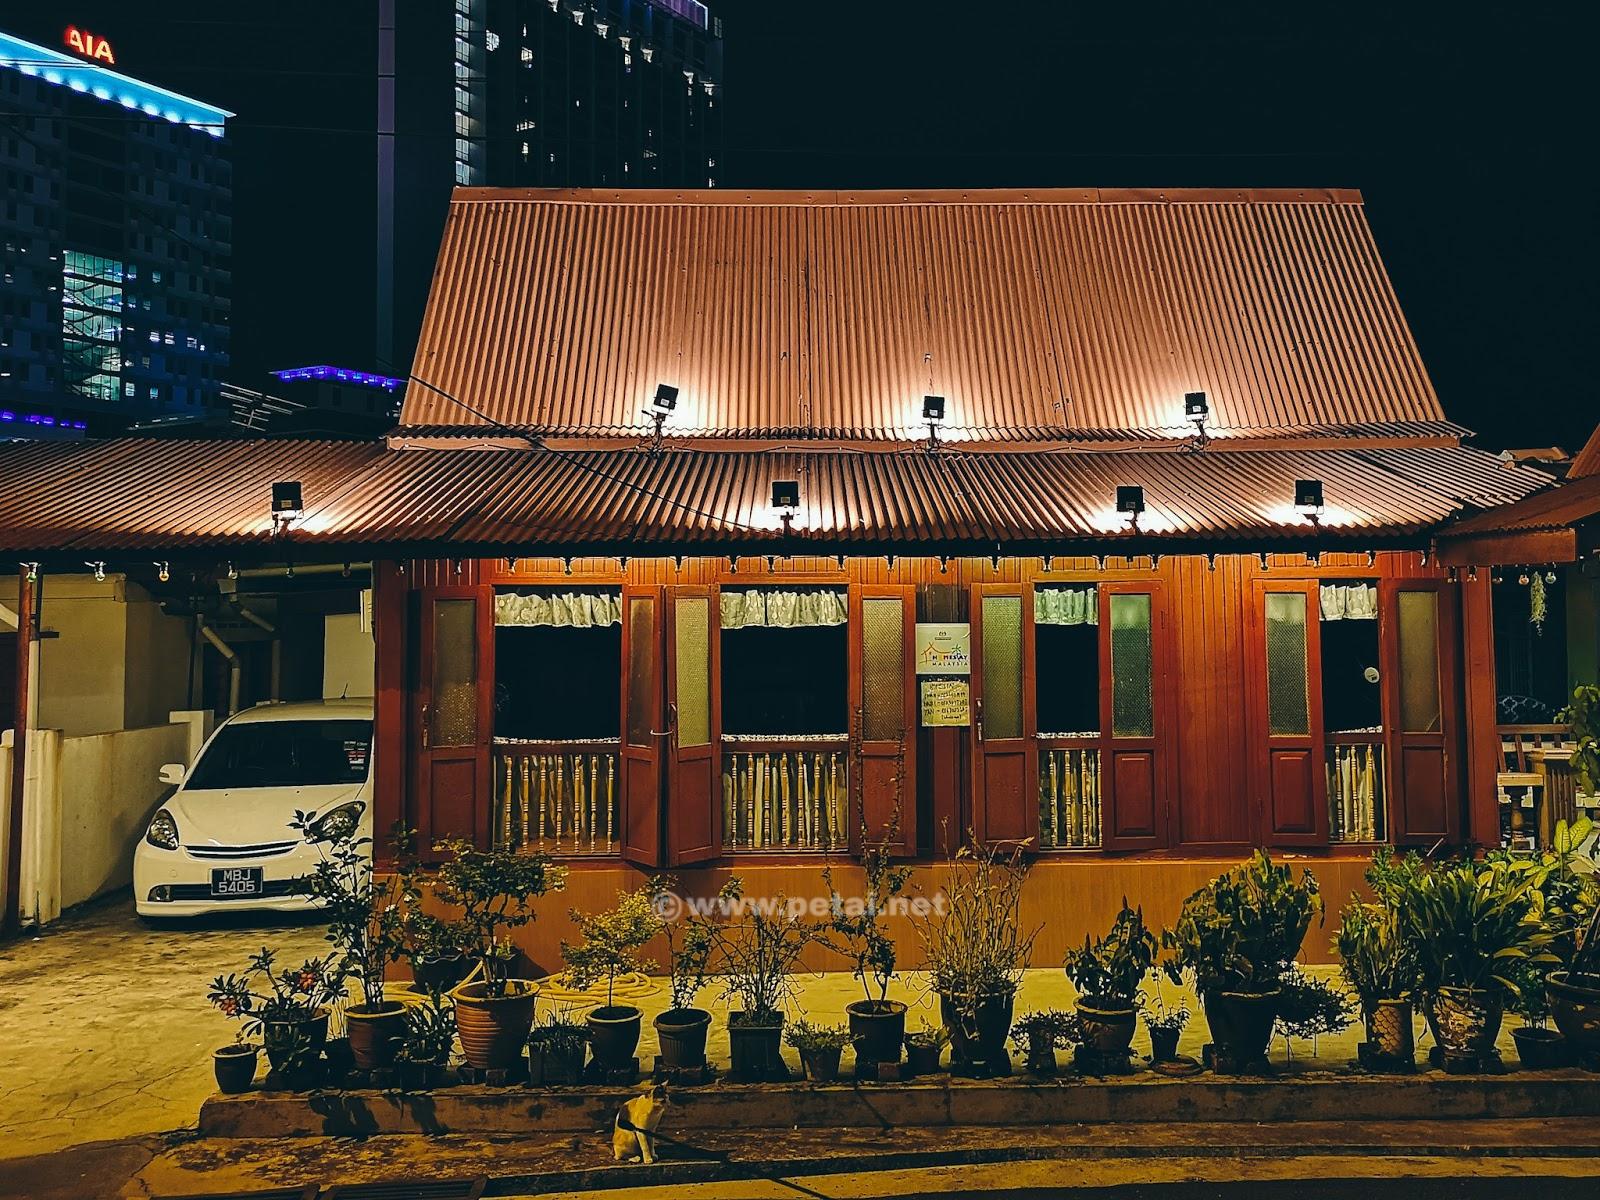 Rumah Melayu Melaka Kampung Morten 1